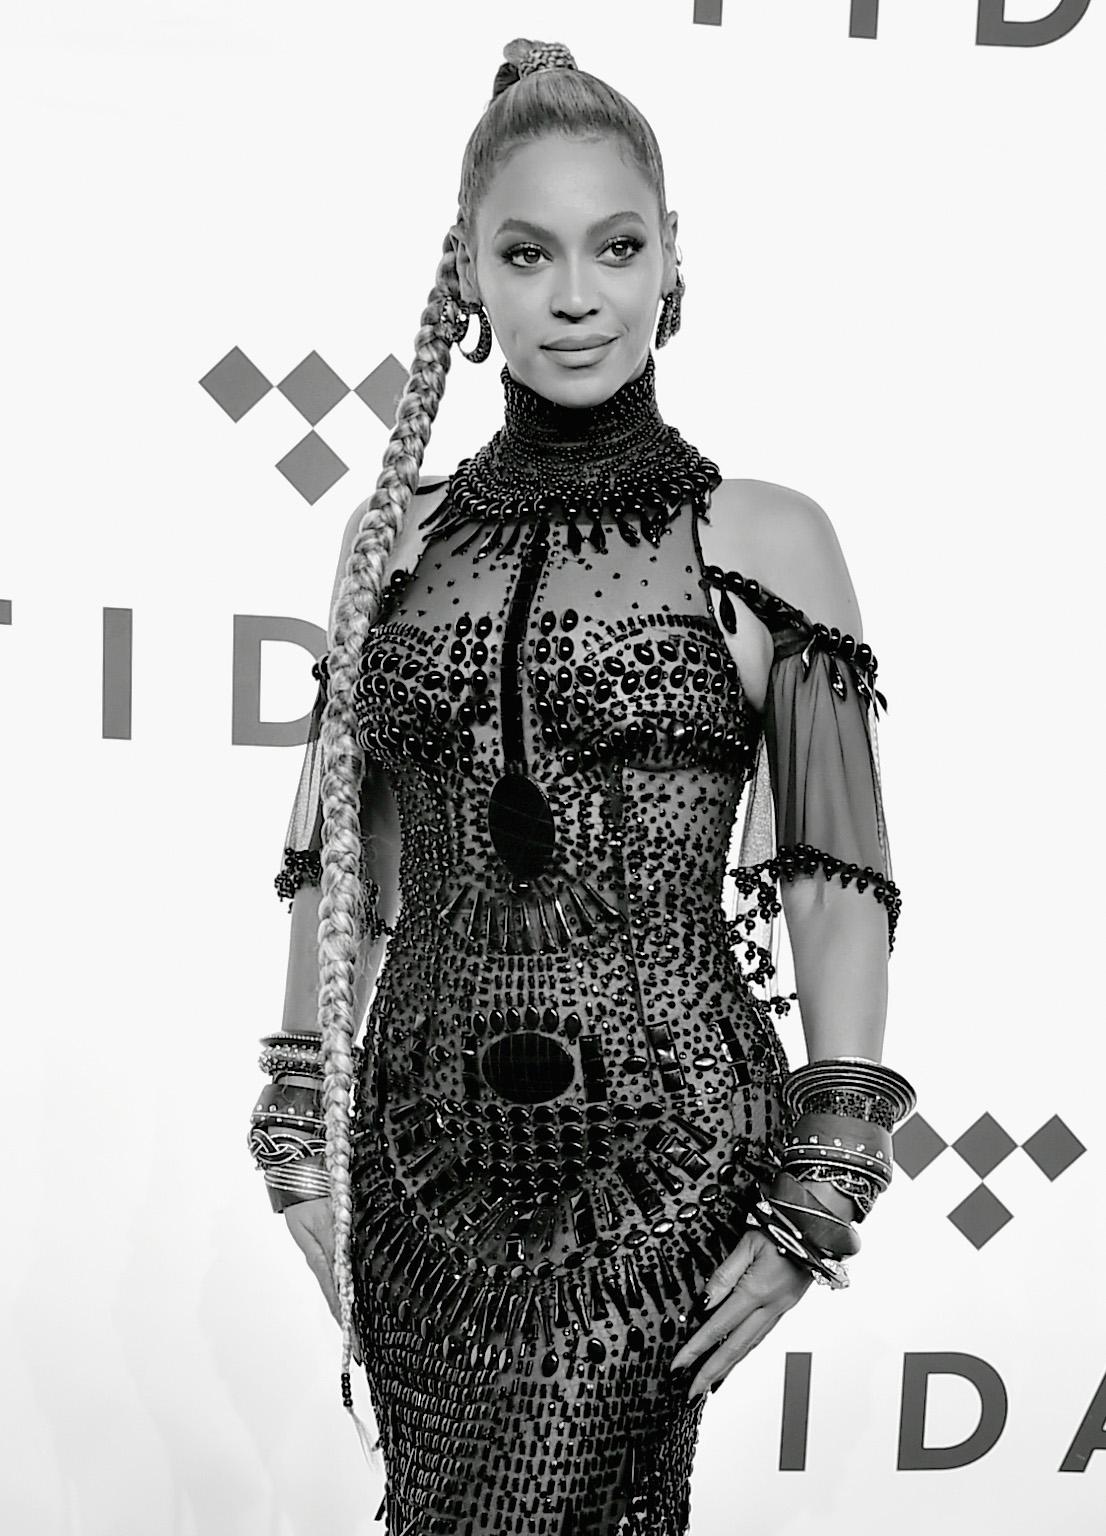 Celebrity Arrivals at TIDAL X: 1015 concert in Brooklyn: Beyonce, Nicki Minaj, T.I., Emeli Sande